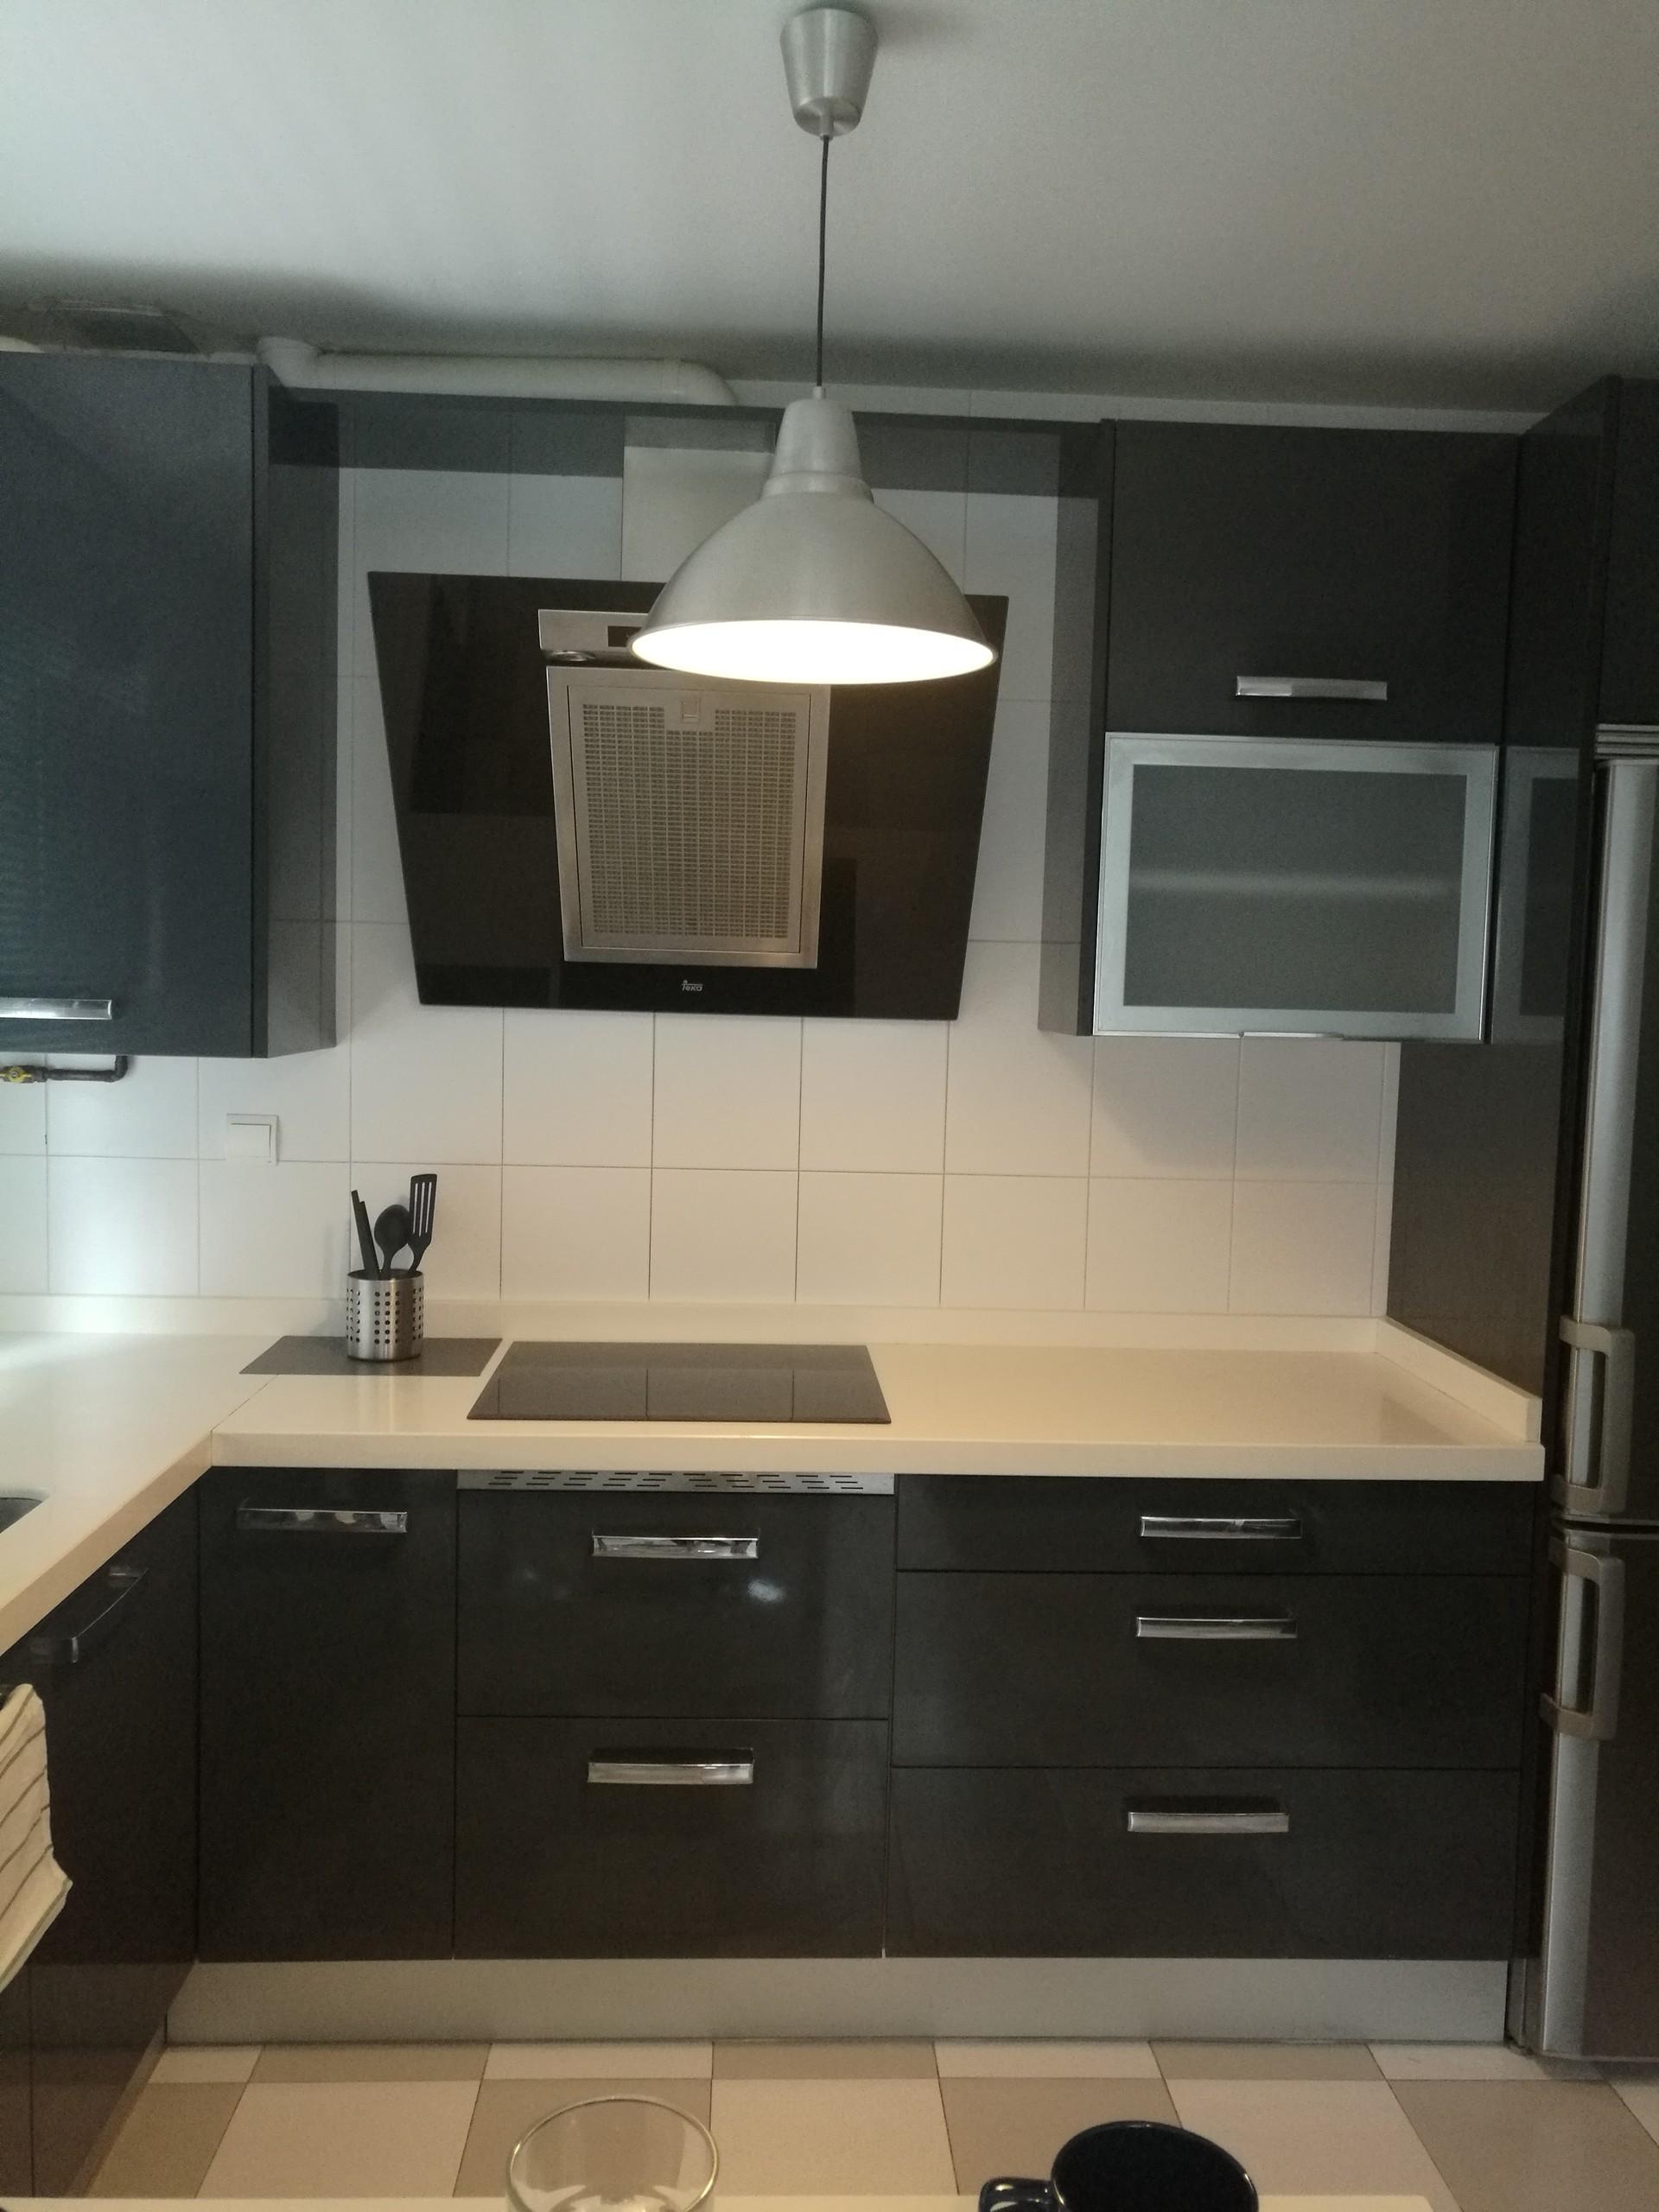 Se alquila precioso apartamento cerca de Santander